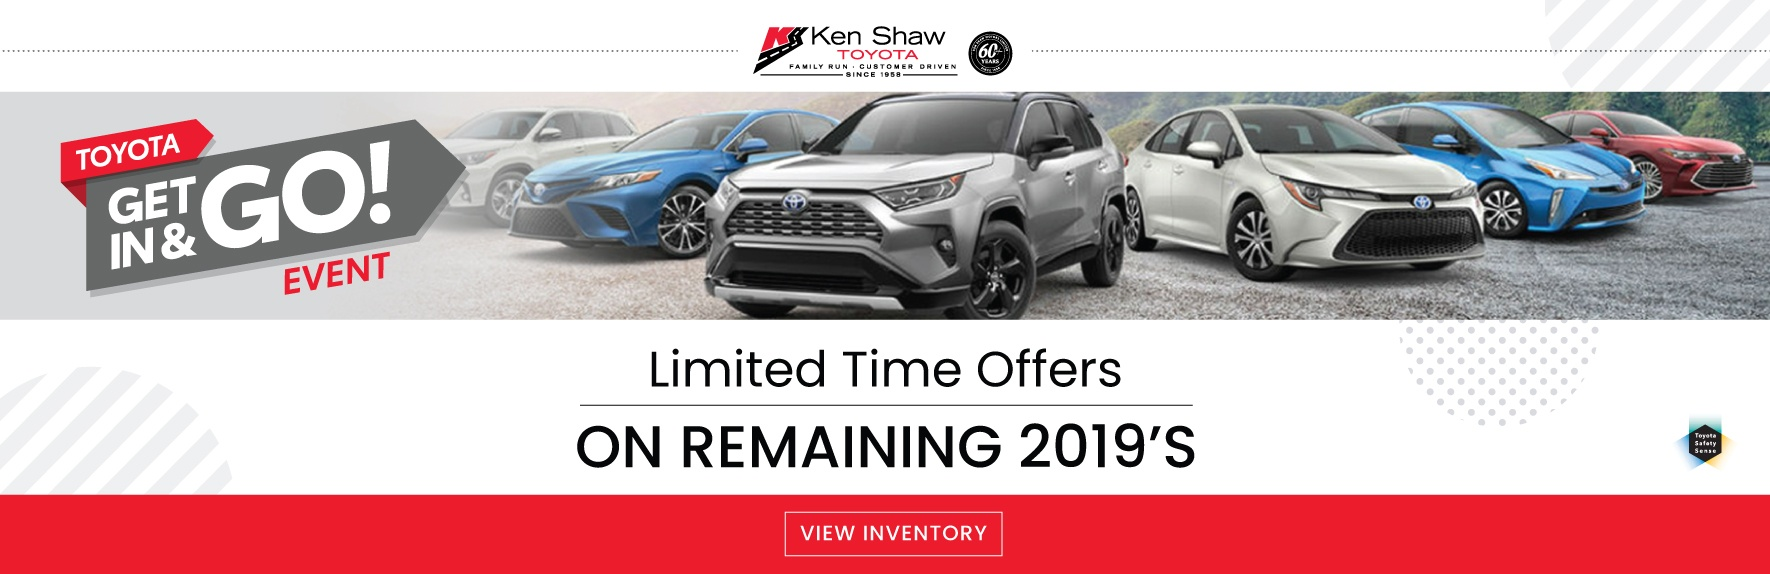 Ken Shaw Toyota 2019 Toyota on sale in Toronto